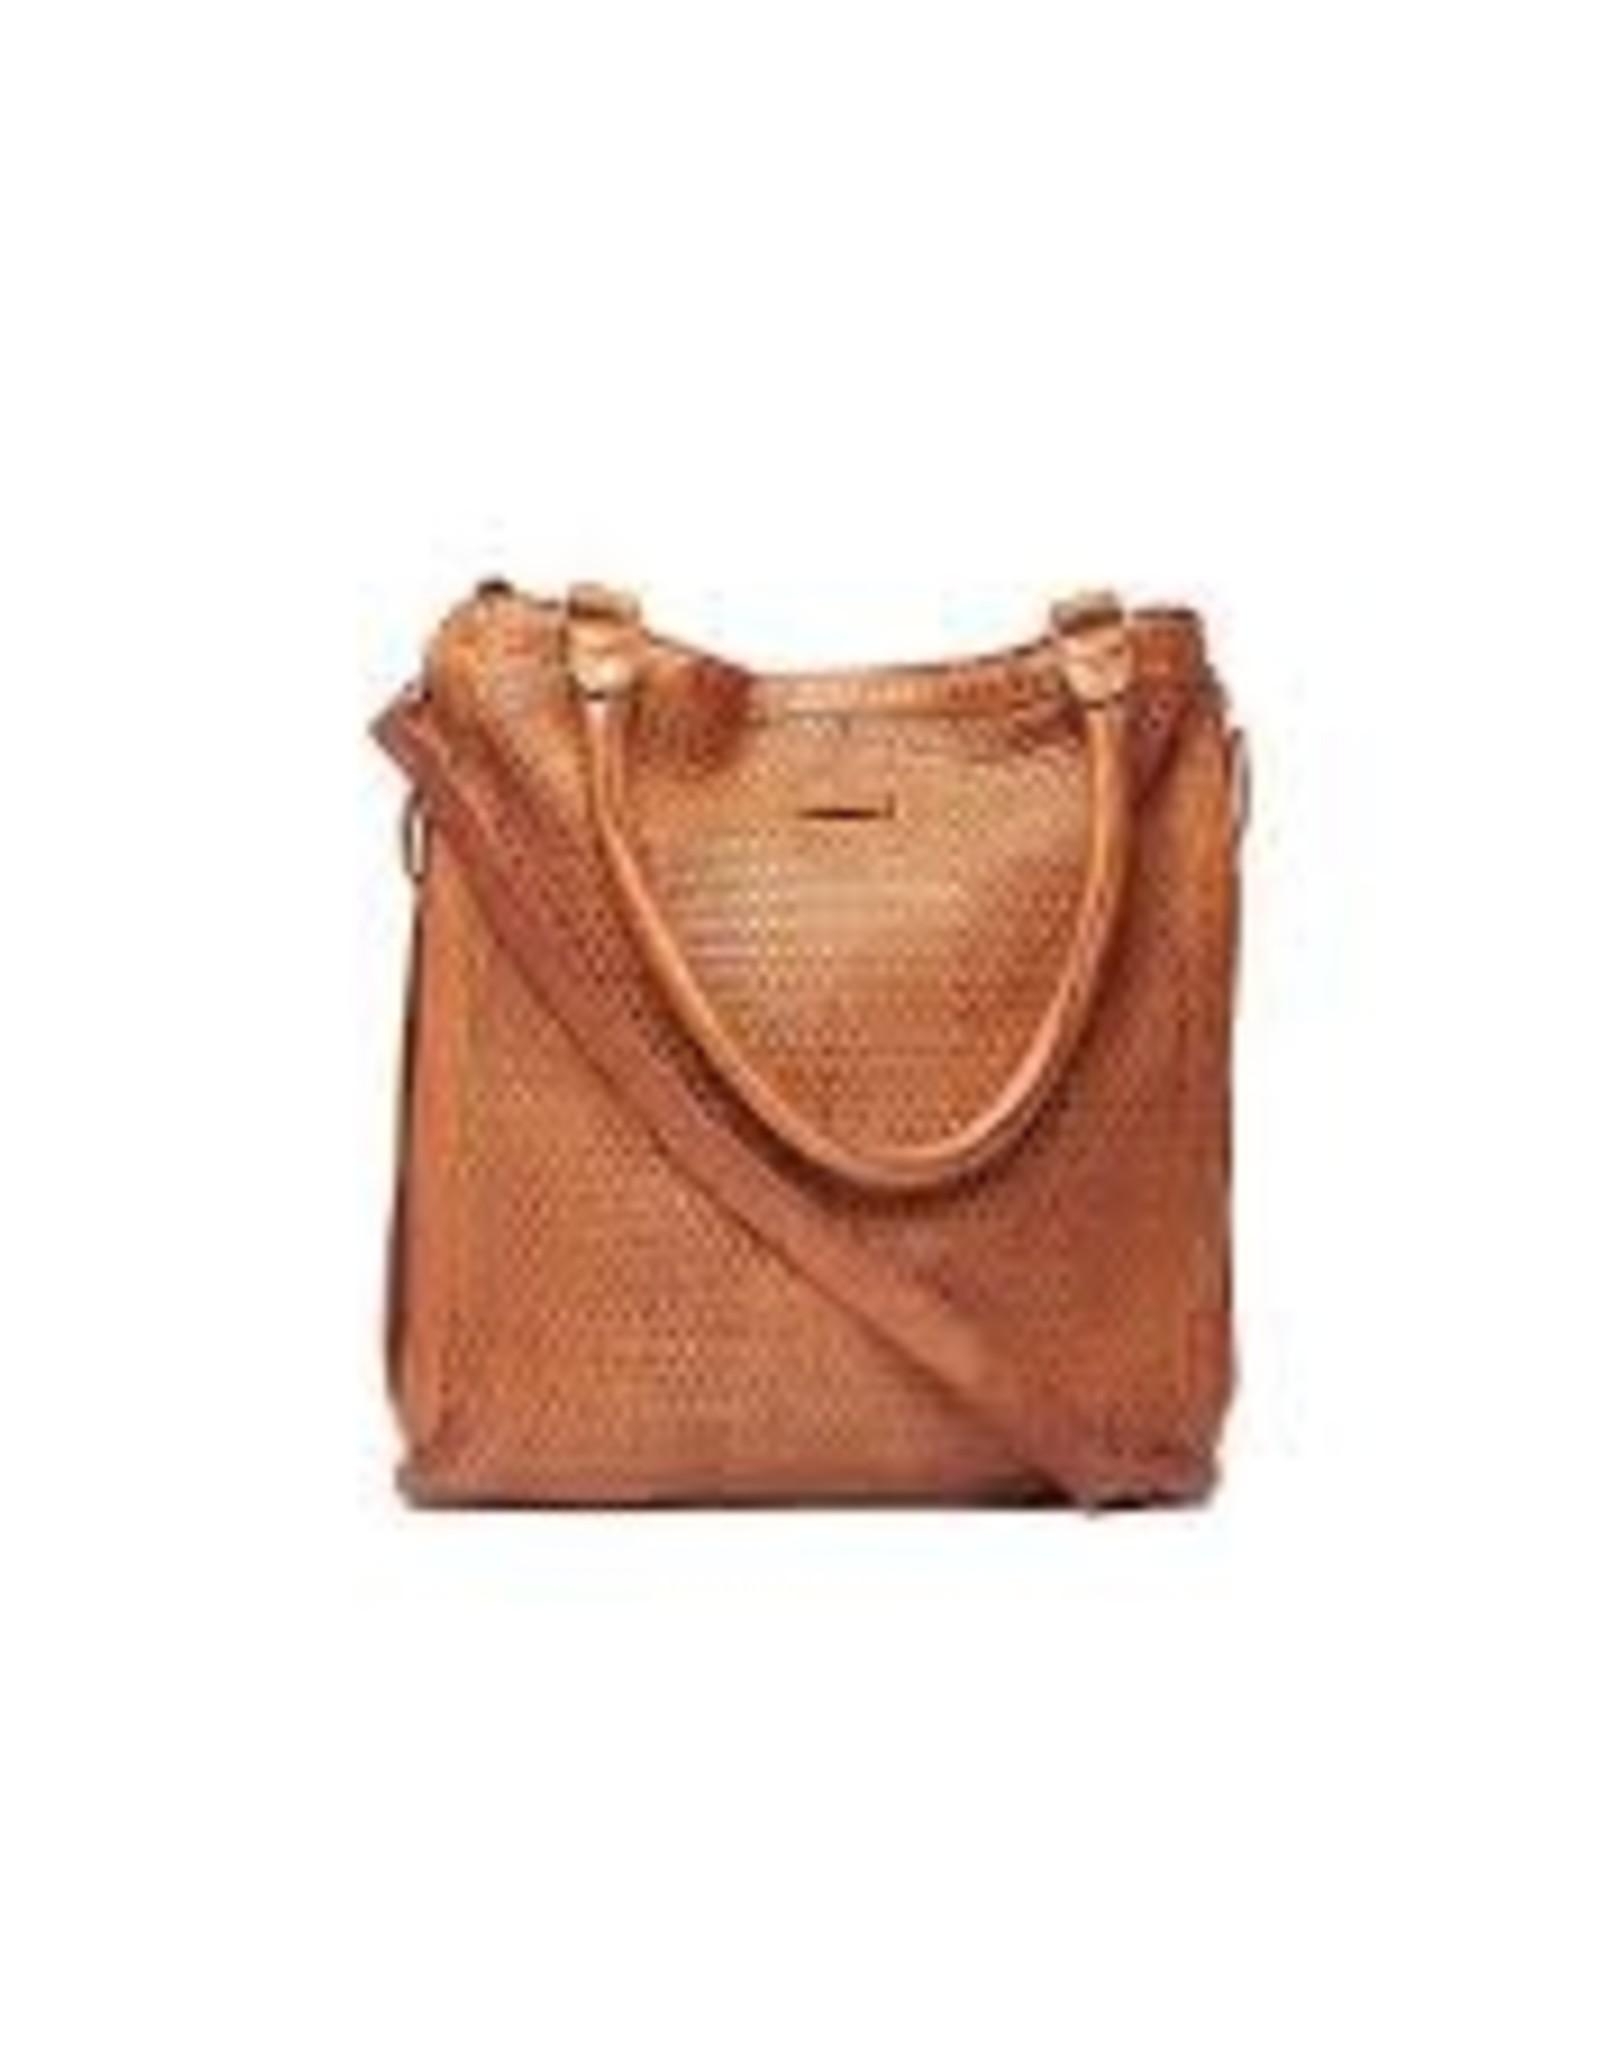 Magnolia woven shoulder sling bag - Cognac